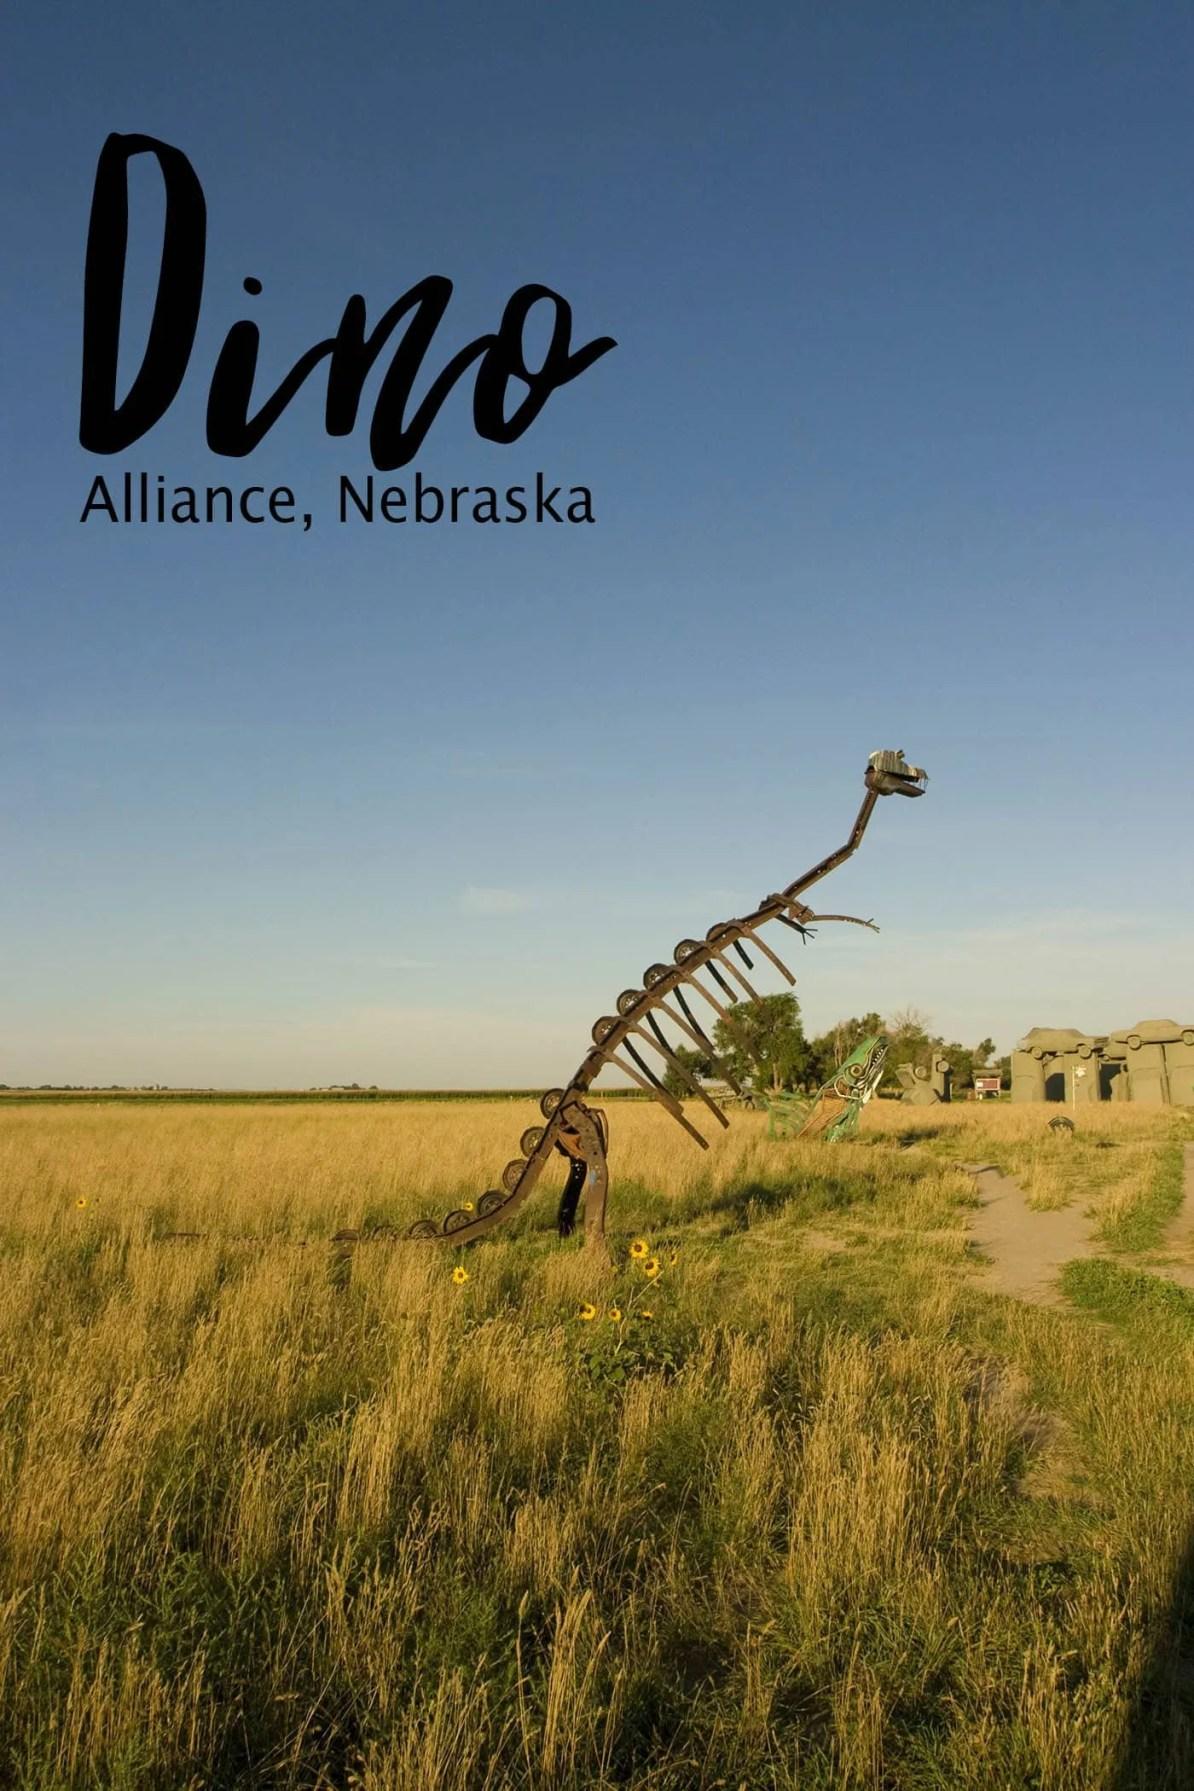 Dino sculpture at Carhenge Roadside Attraction in Alliance, Nebraska